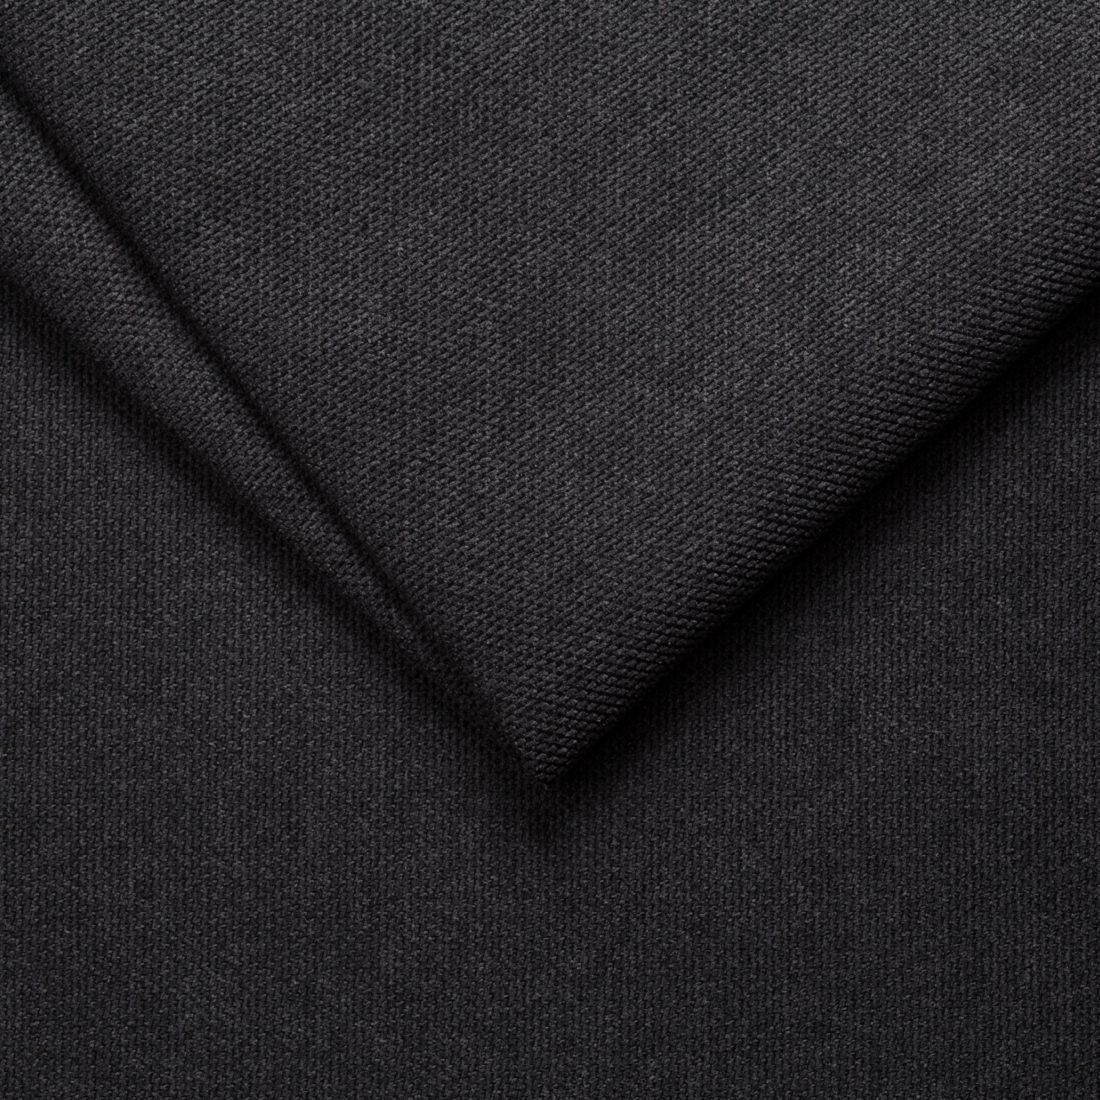 Меблева тканина Austin 21 Black, рогожка